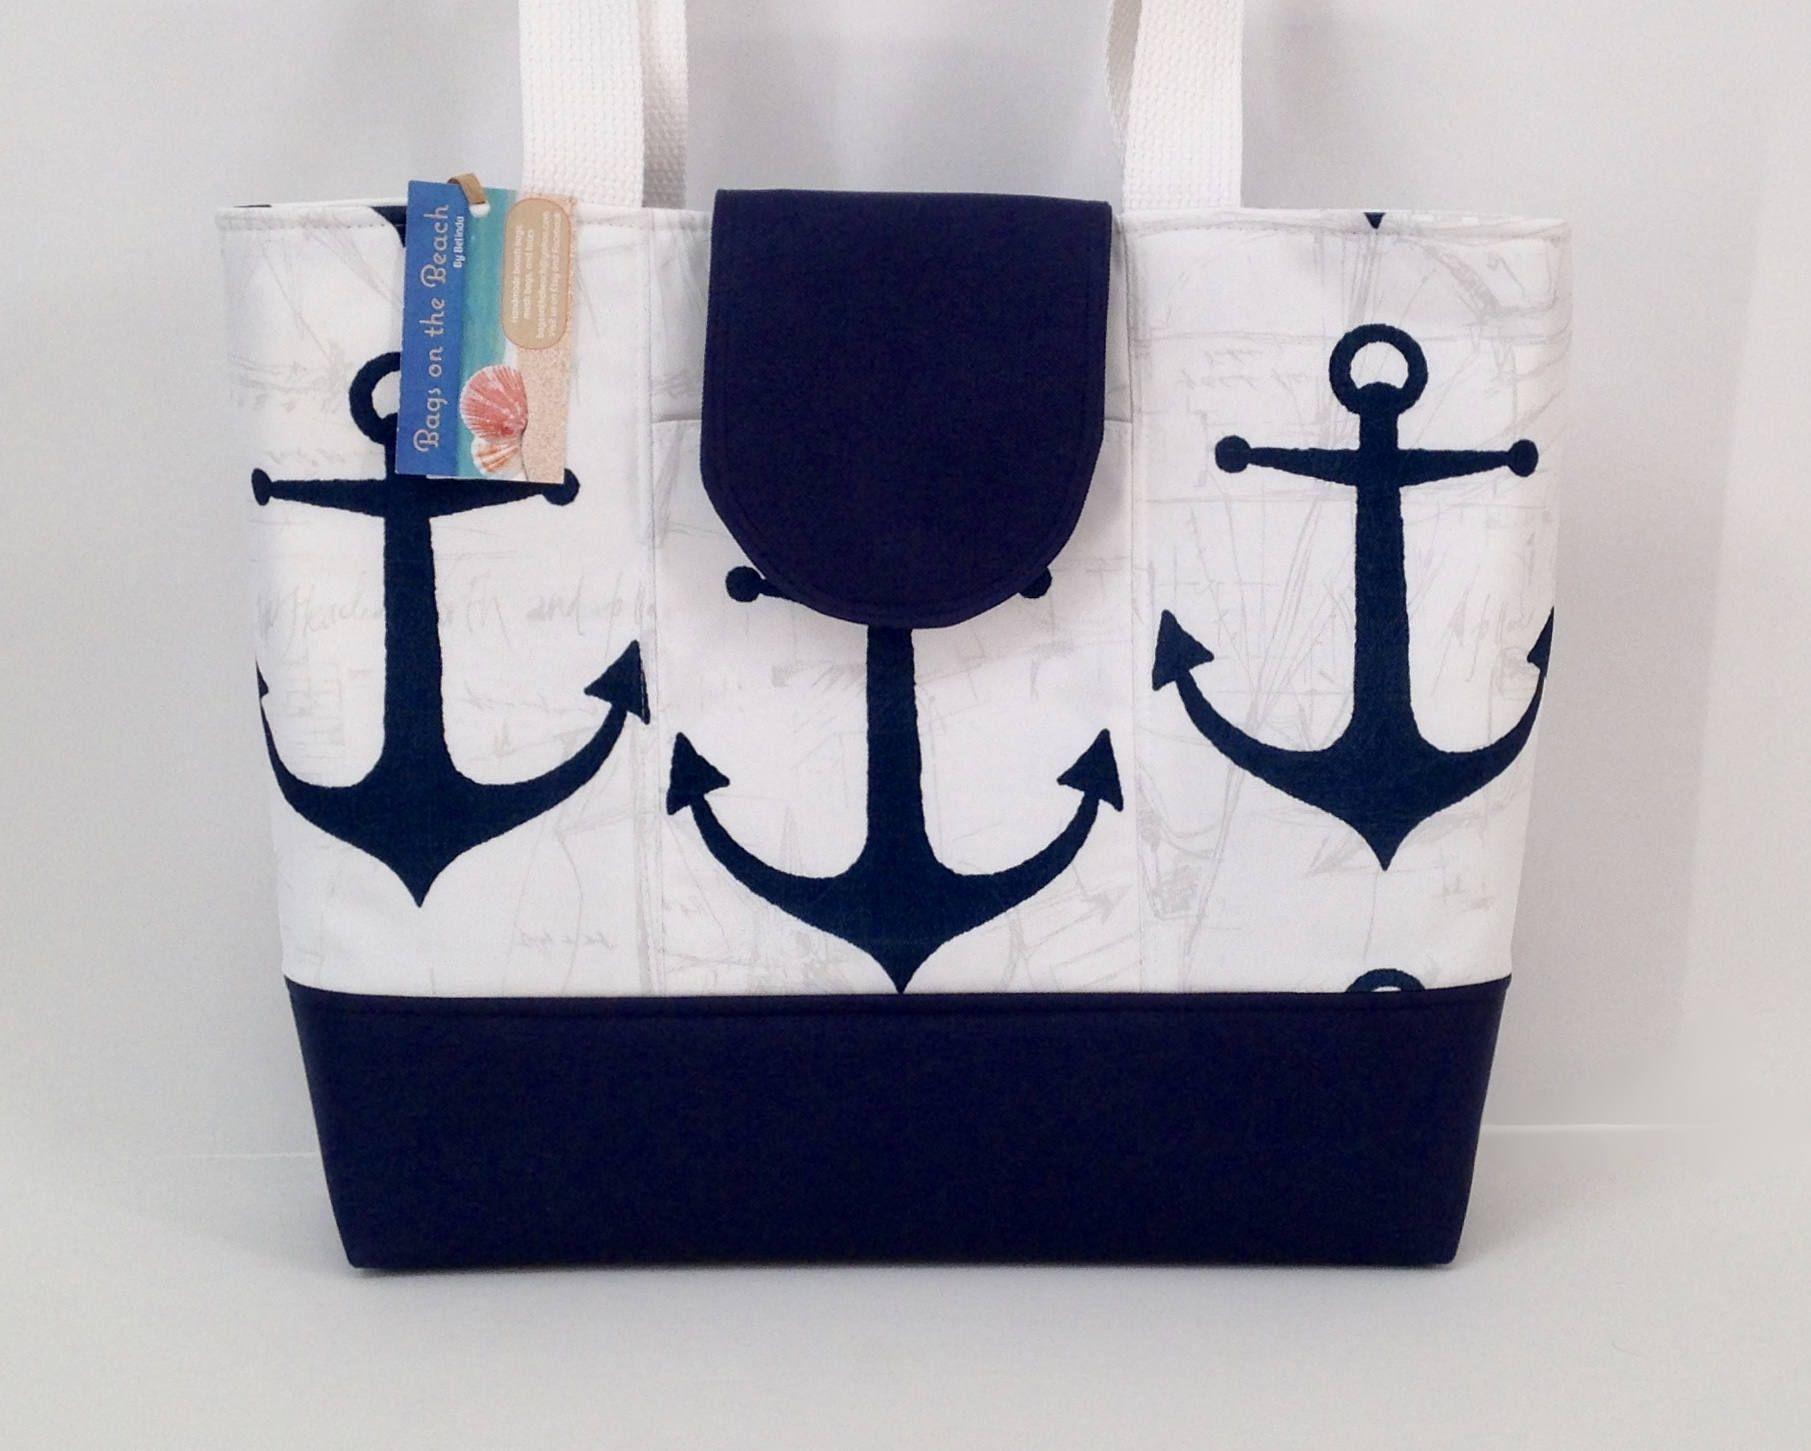 bf9483c0140 Navy Anchors Zippered Beach Bag, Beach Tote Bag, Nautical Beach Bag,  Waterproof Bottom, White   Navy, Overnight Bag, Diaper Bag by  BagsOnTheBeach on Etsy